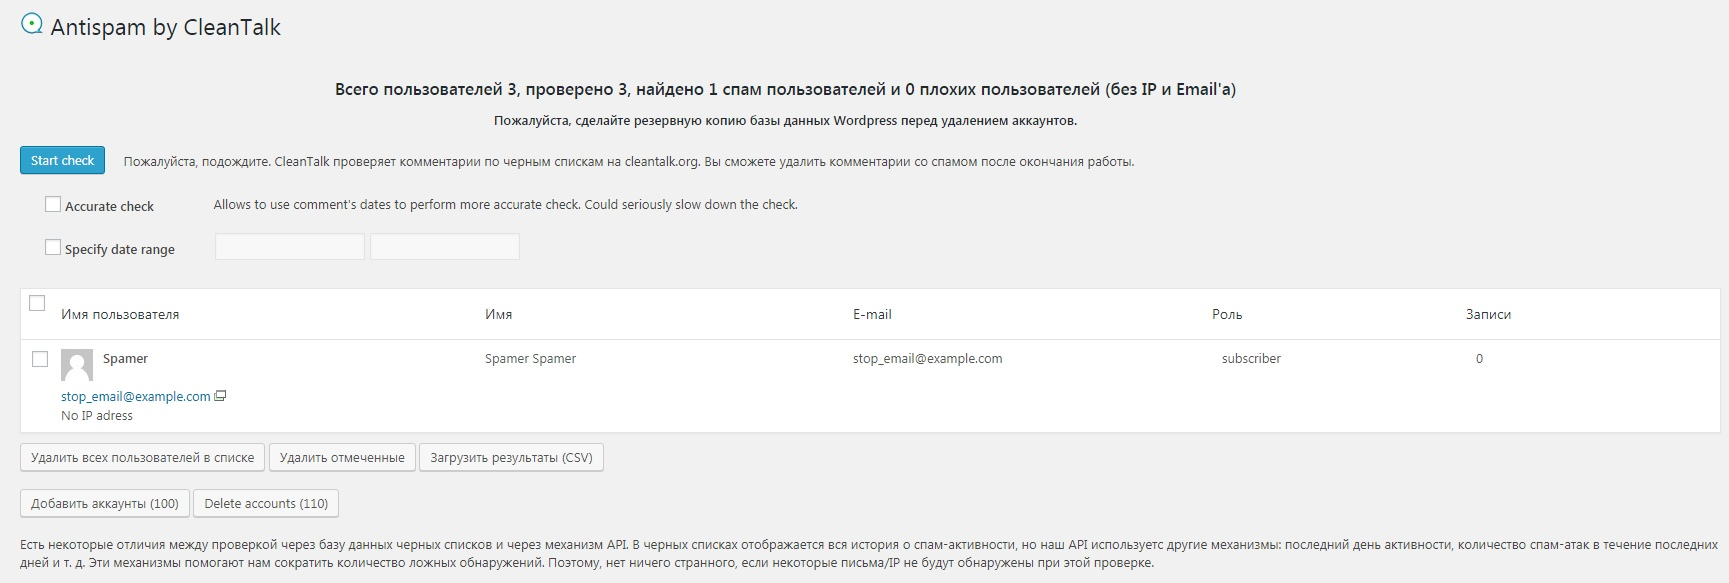 Проверка пользователей на спам на WordPress